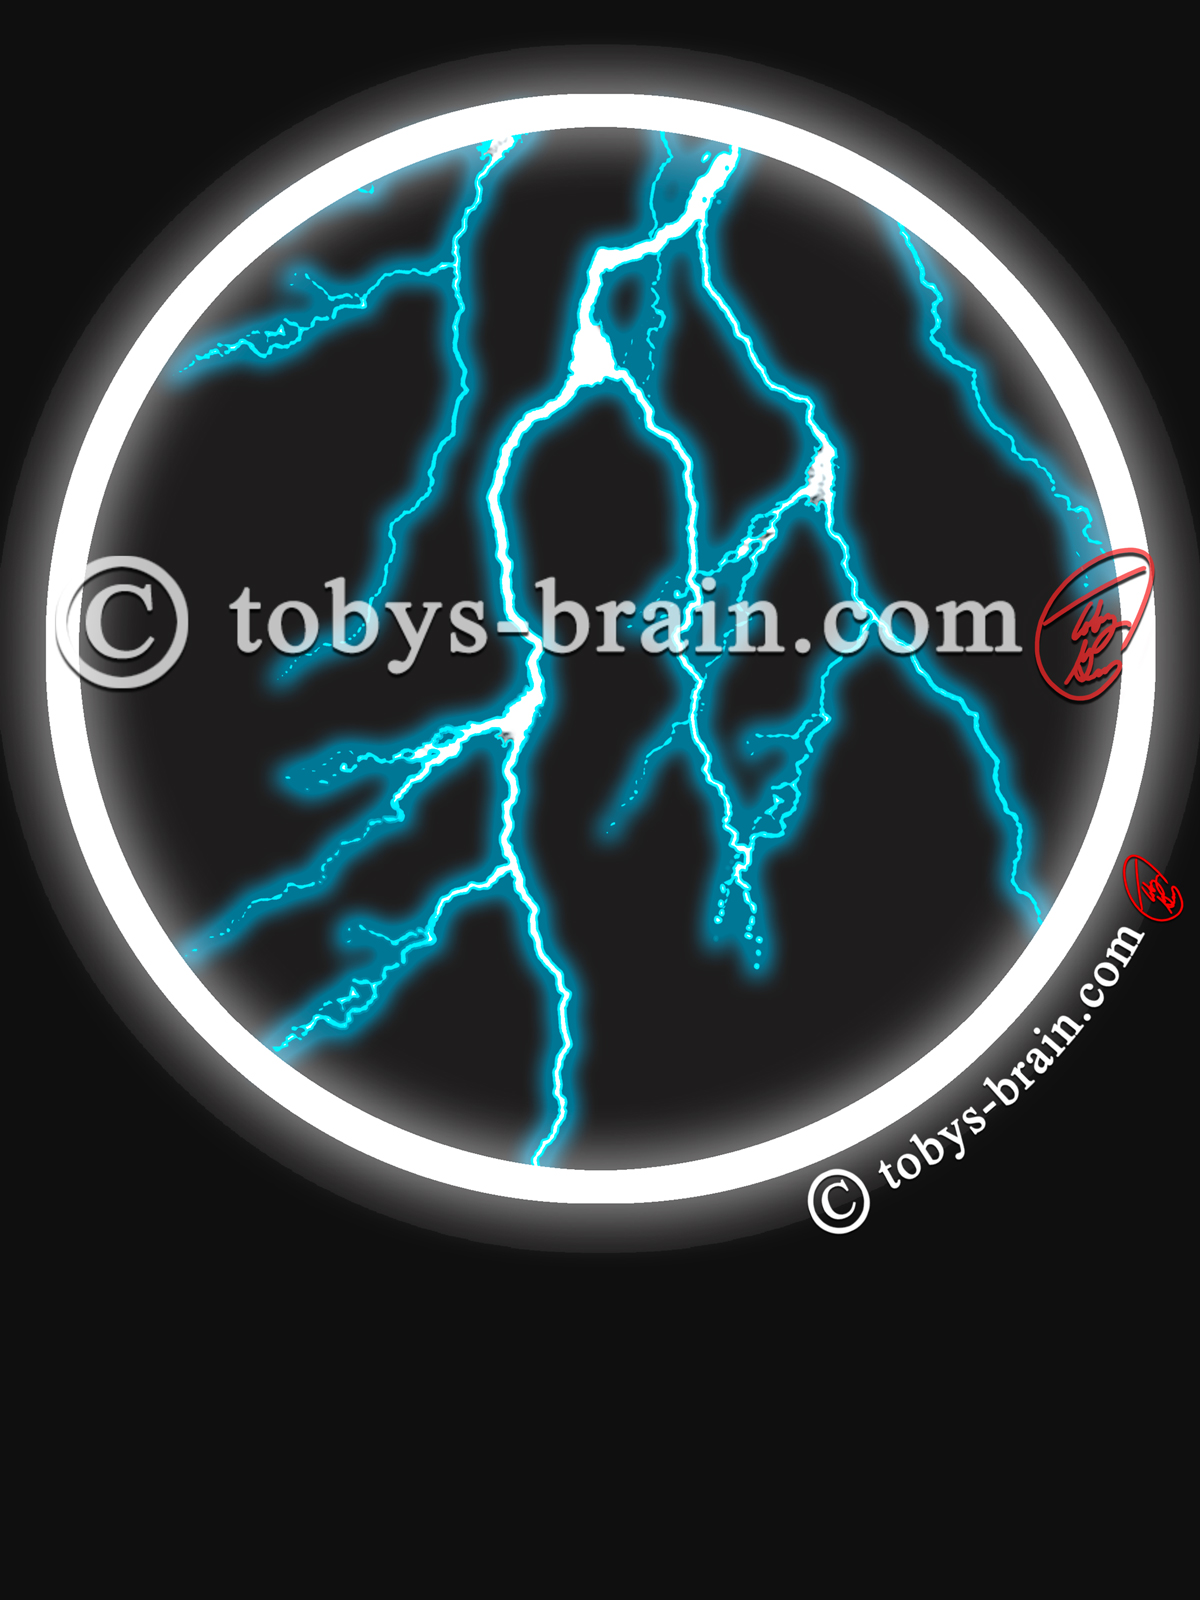 Toby-Gray-black-white-circle-blue-lightning-shirt-design